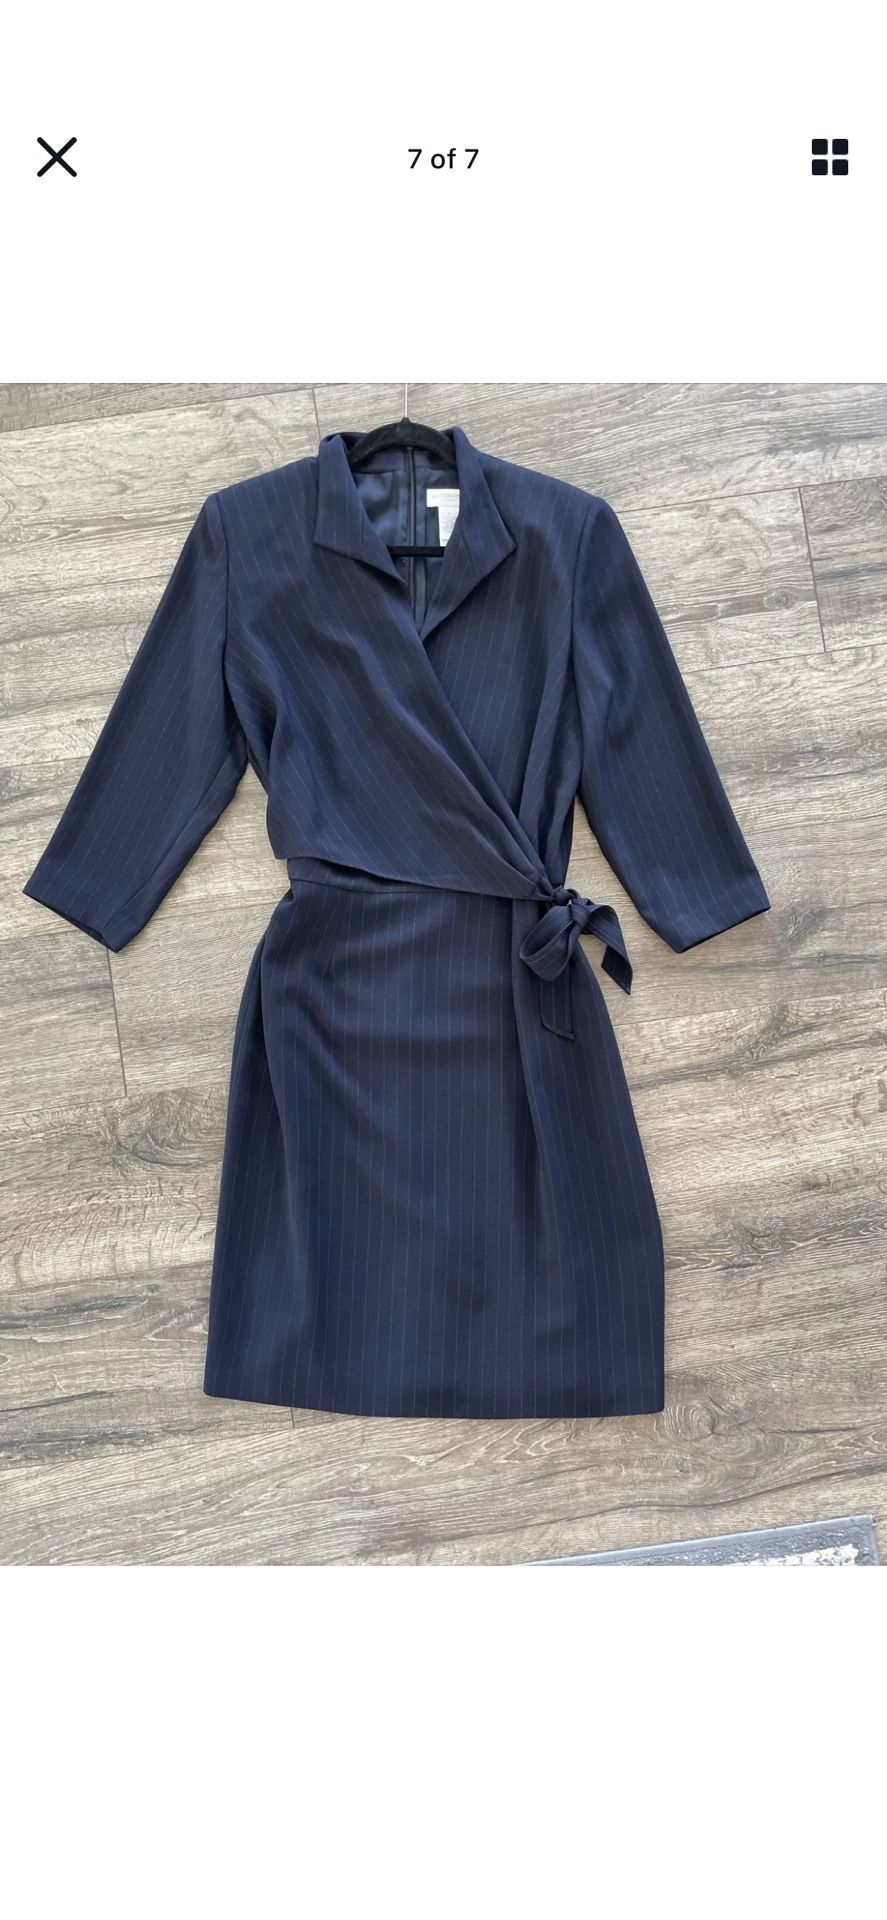 Liz Claiborne Wrap Dress: Navy Blue with Metallic Striping and Side Tie Size 12